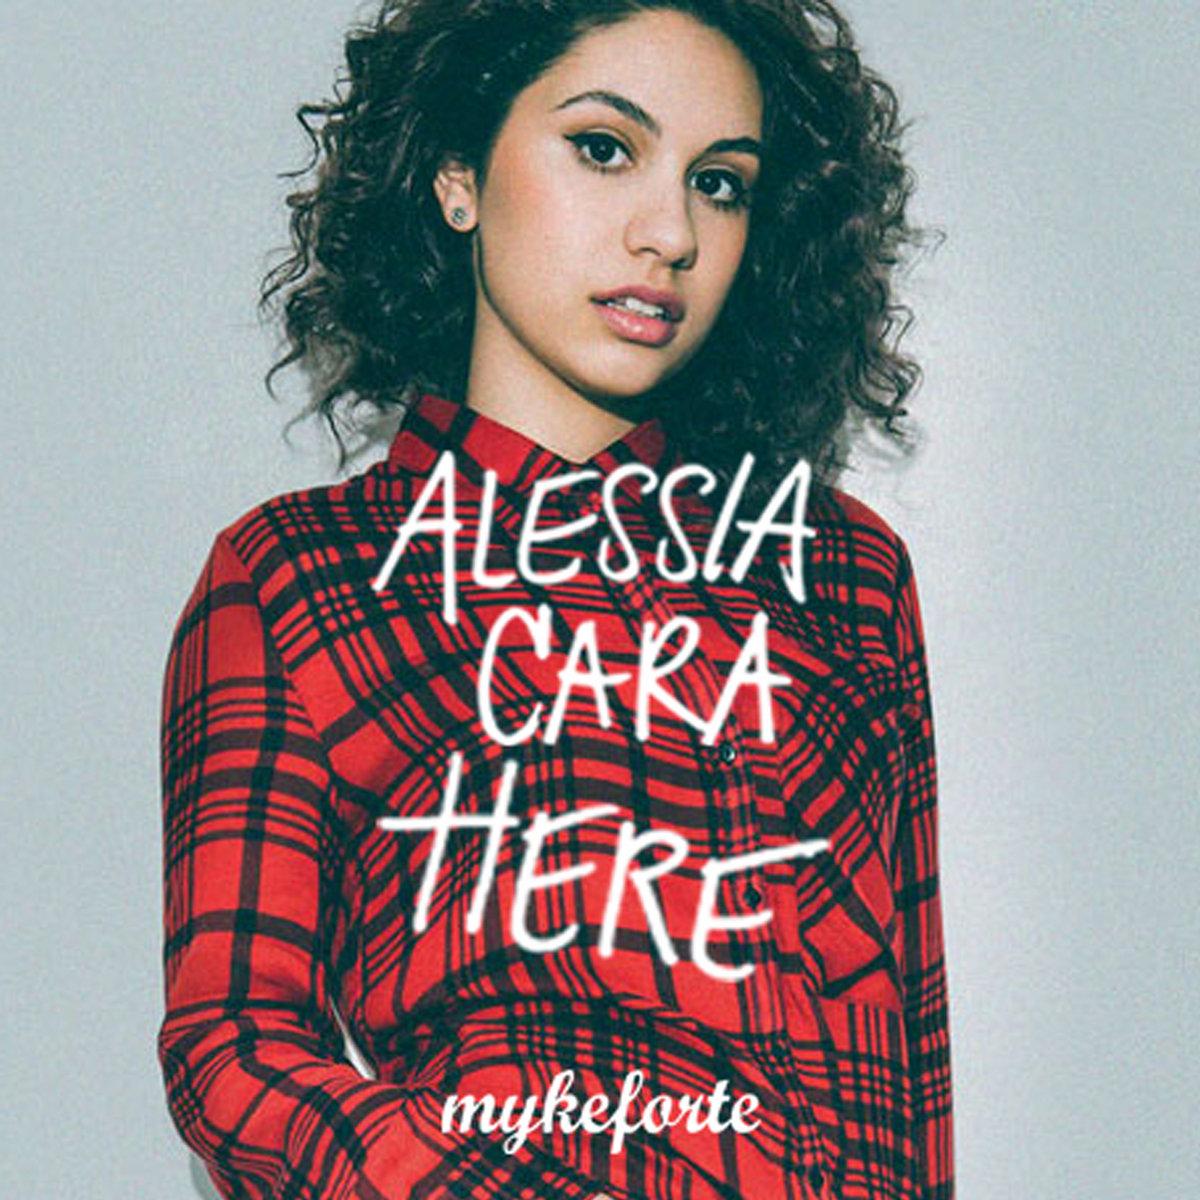 Alessia cara here скачать